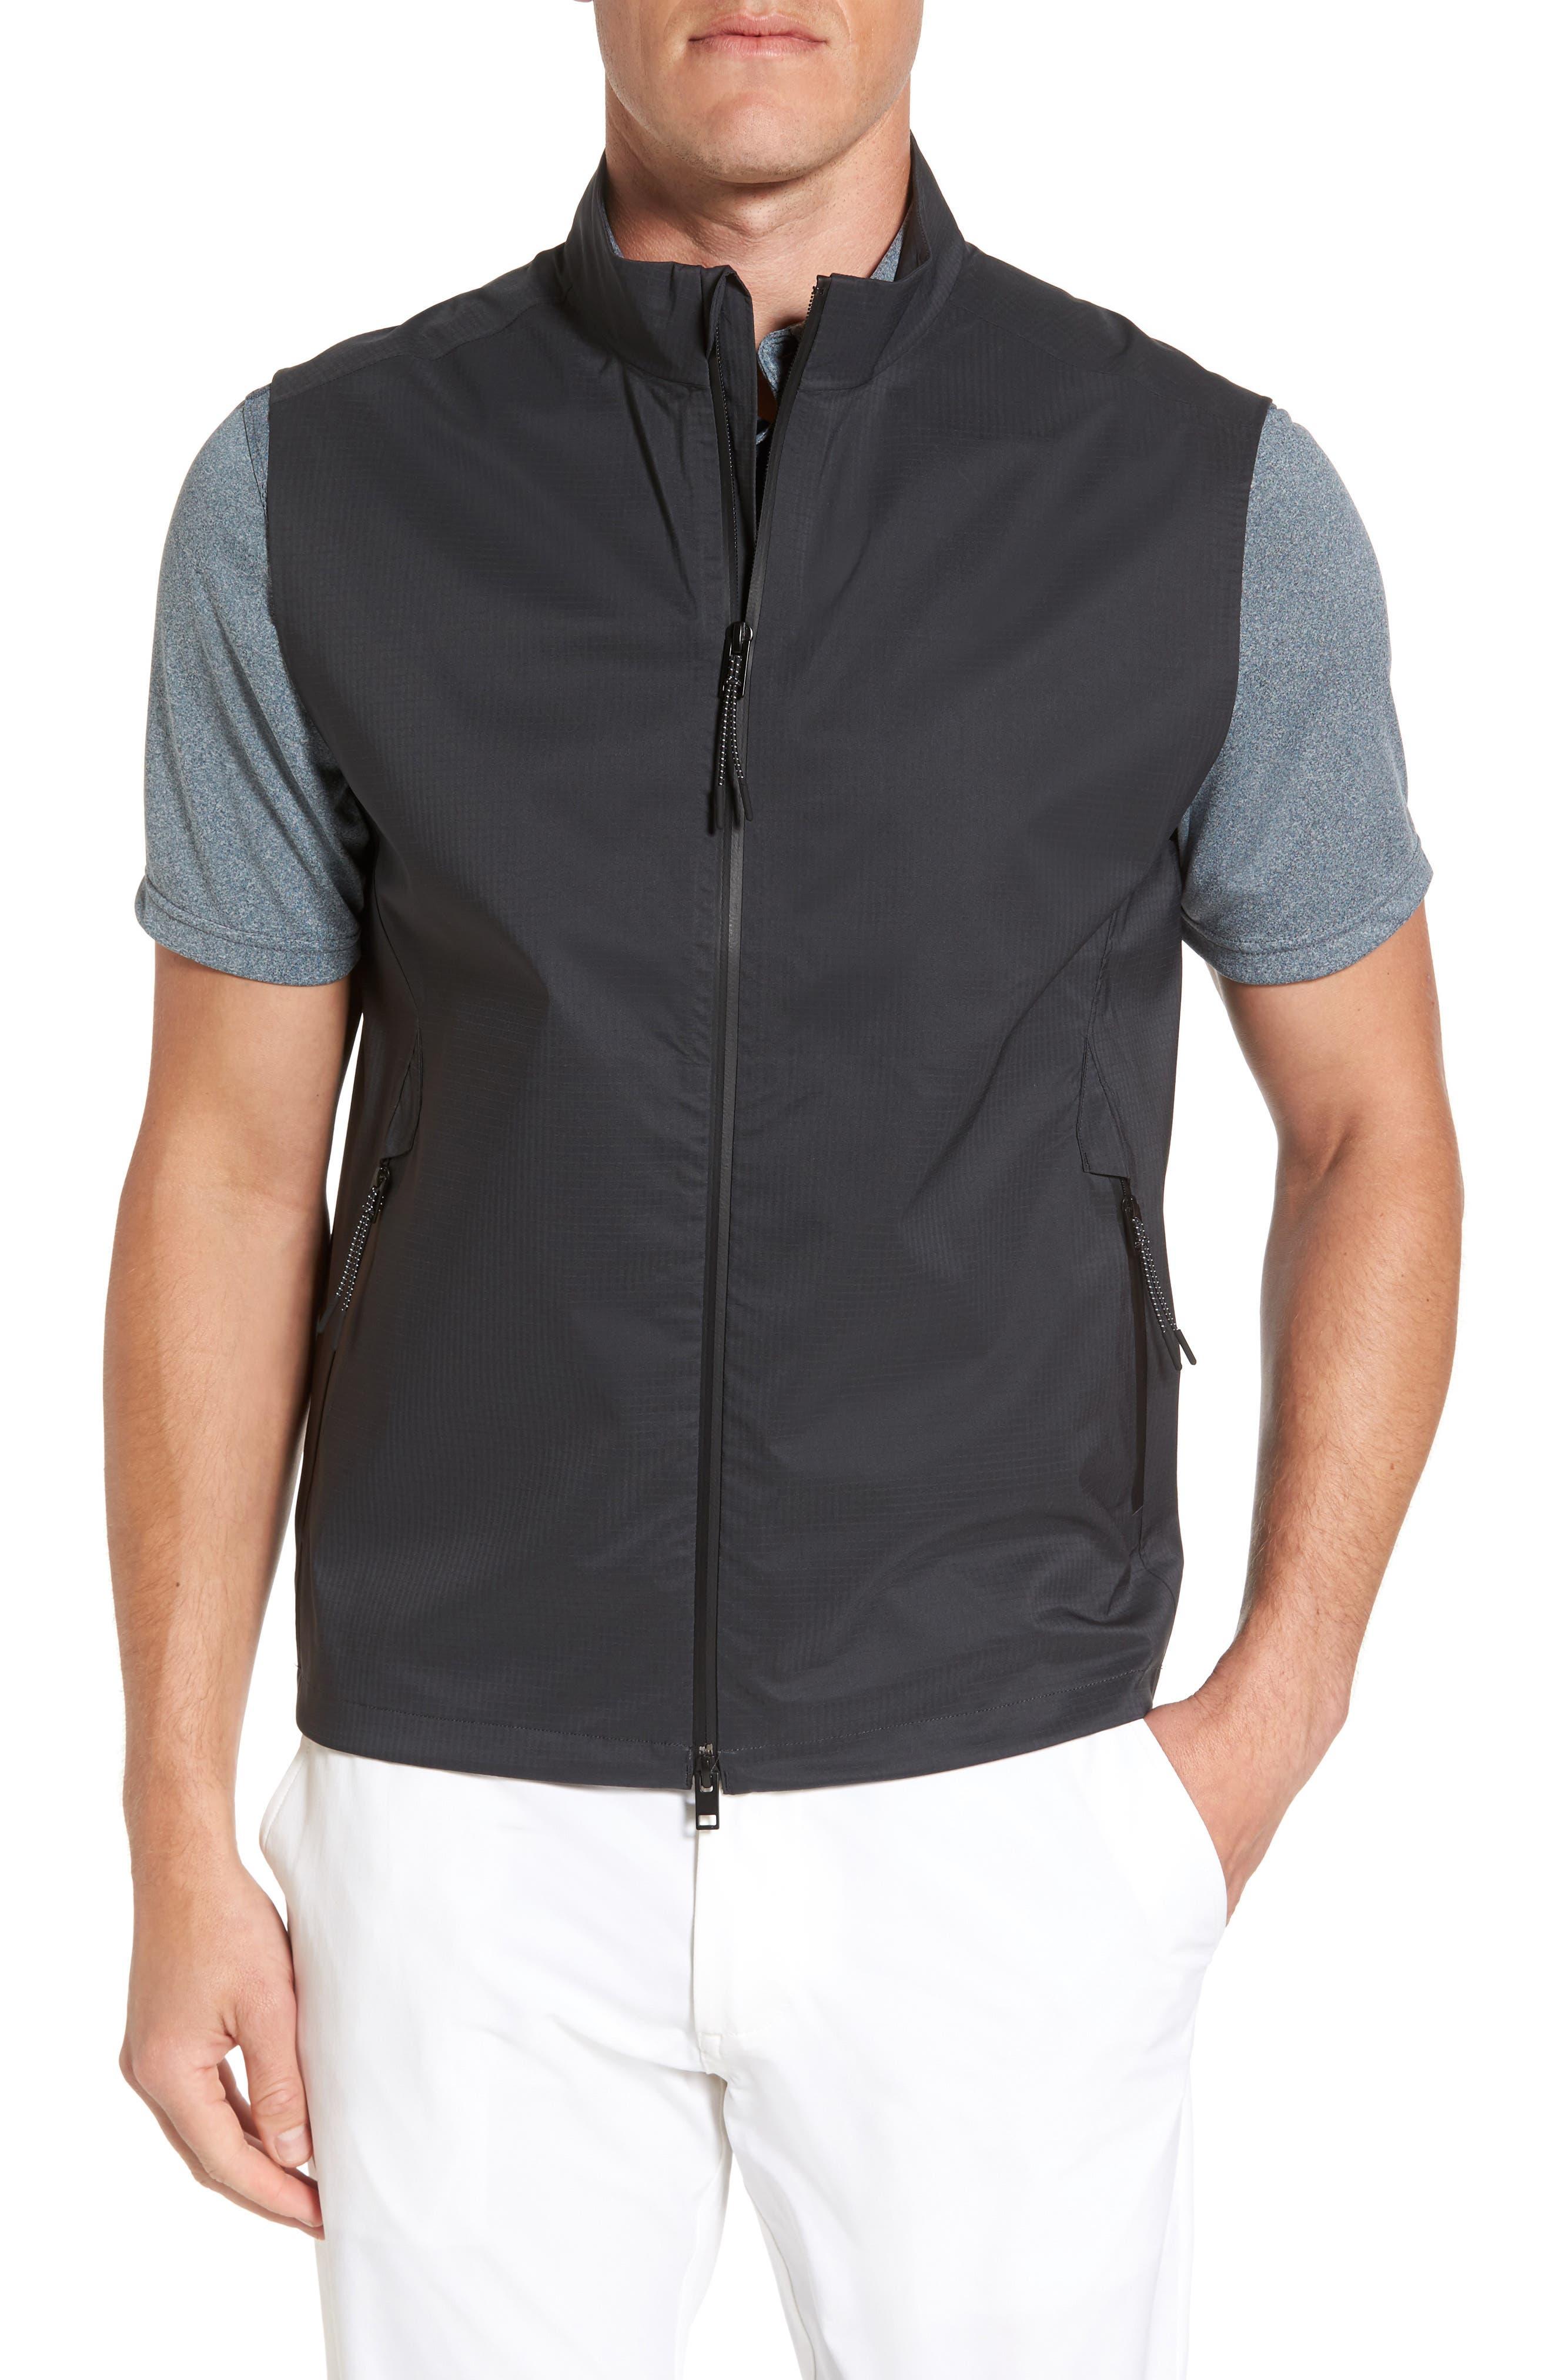 Alternate Image 1 Selected - AG Newton Ripstop Vest